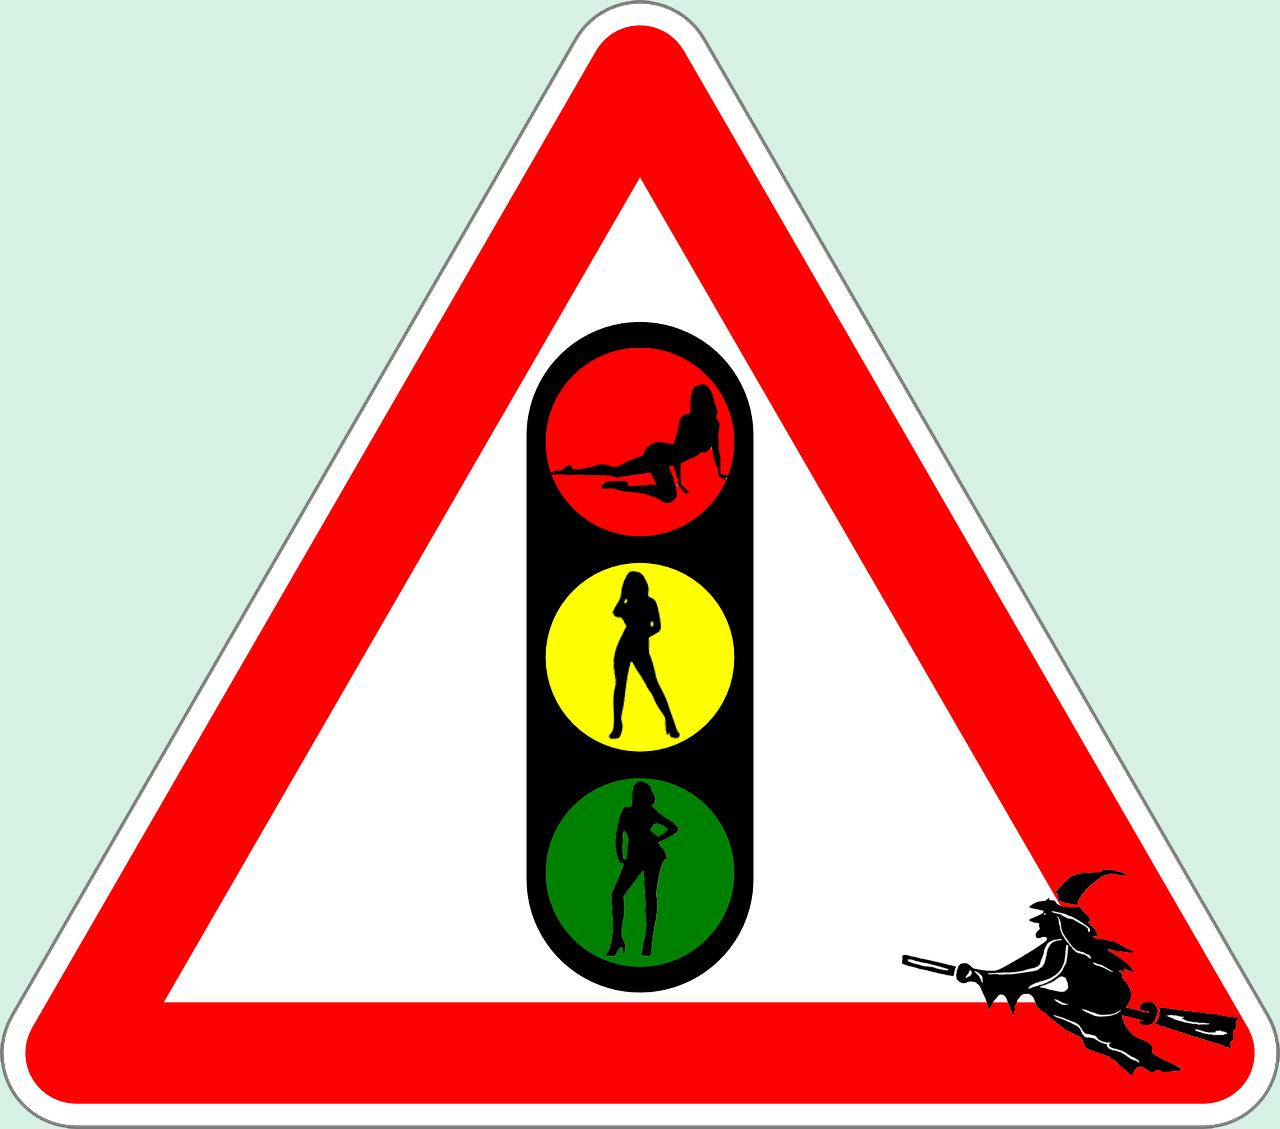 1.traffic-sign-160660_1280